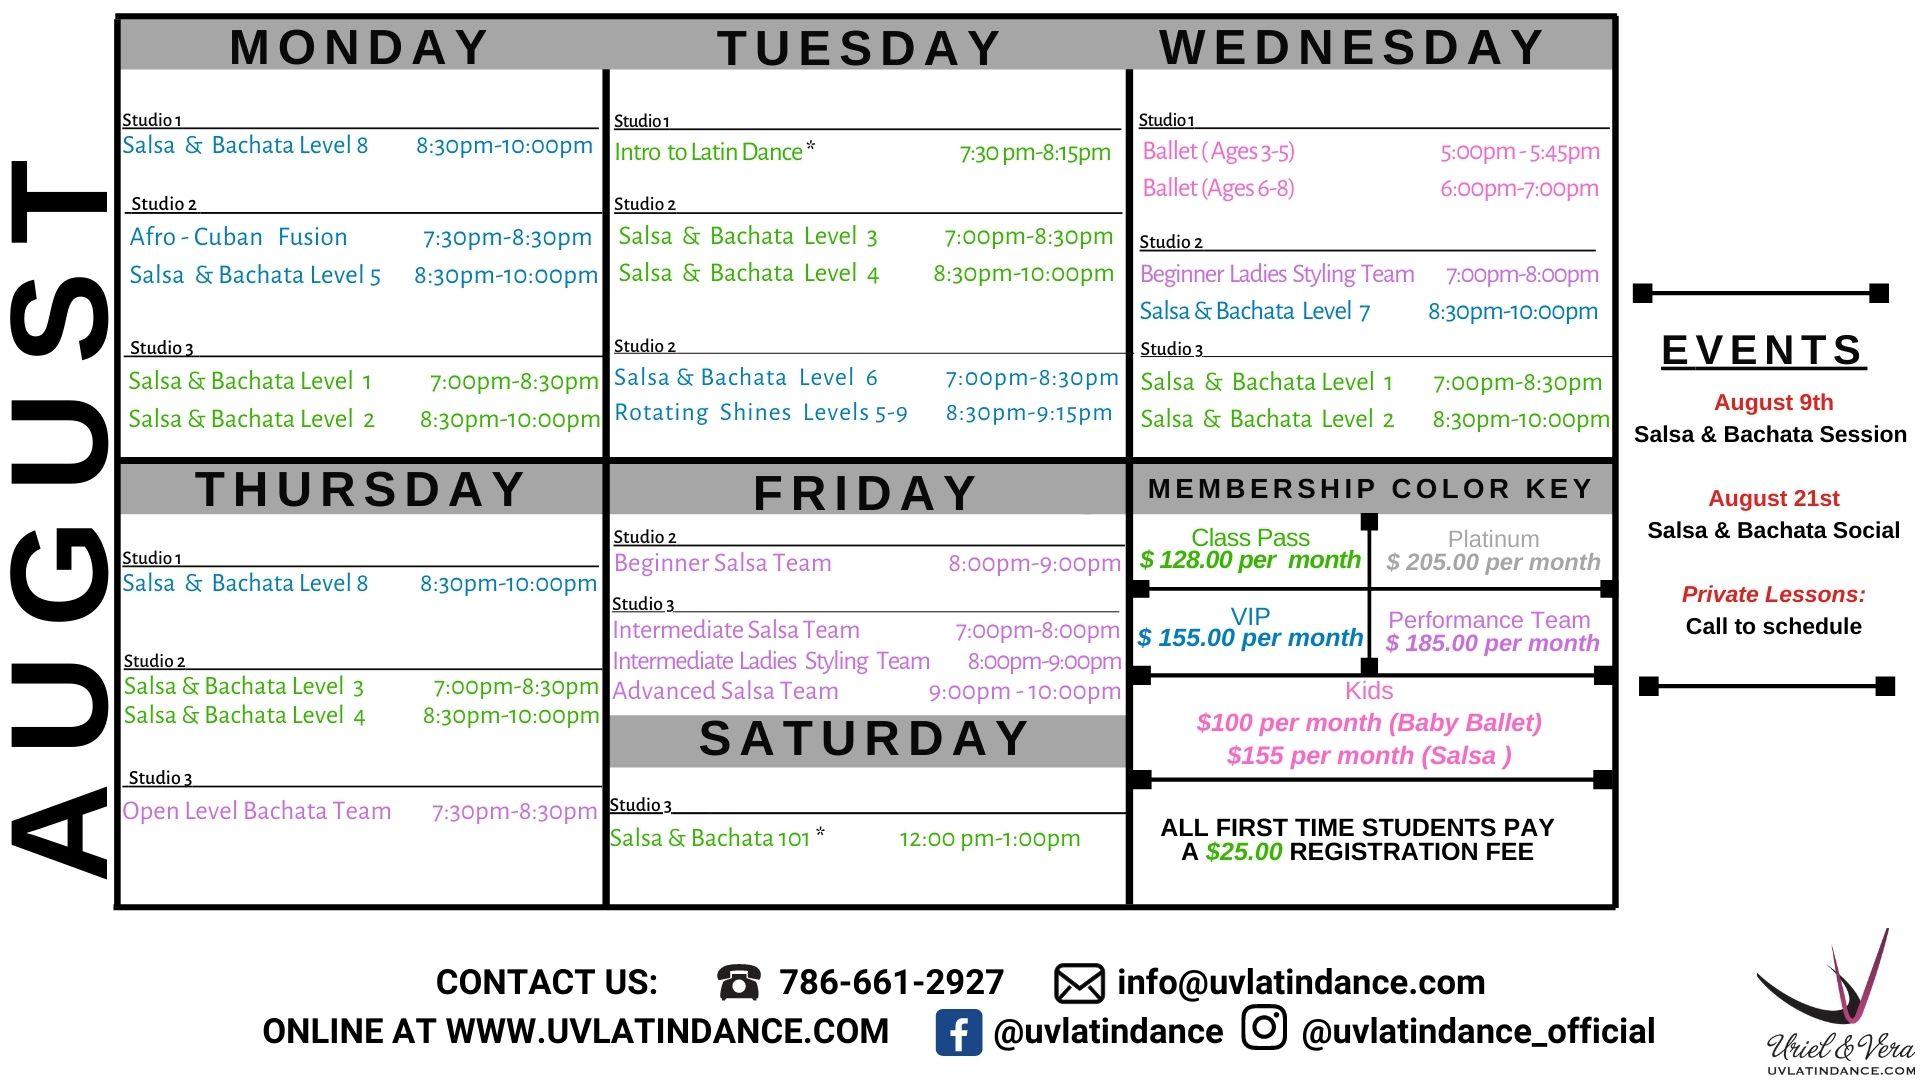 UV Latin Dance Academy - Salsa & Bachata Classes, Latin